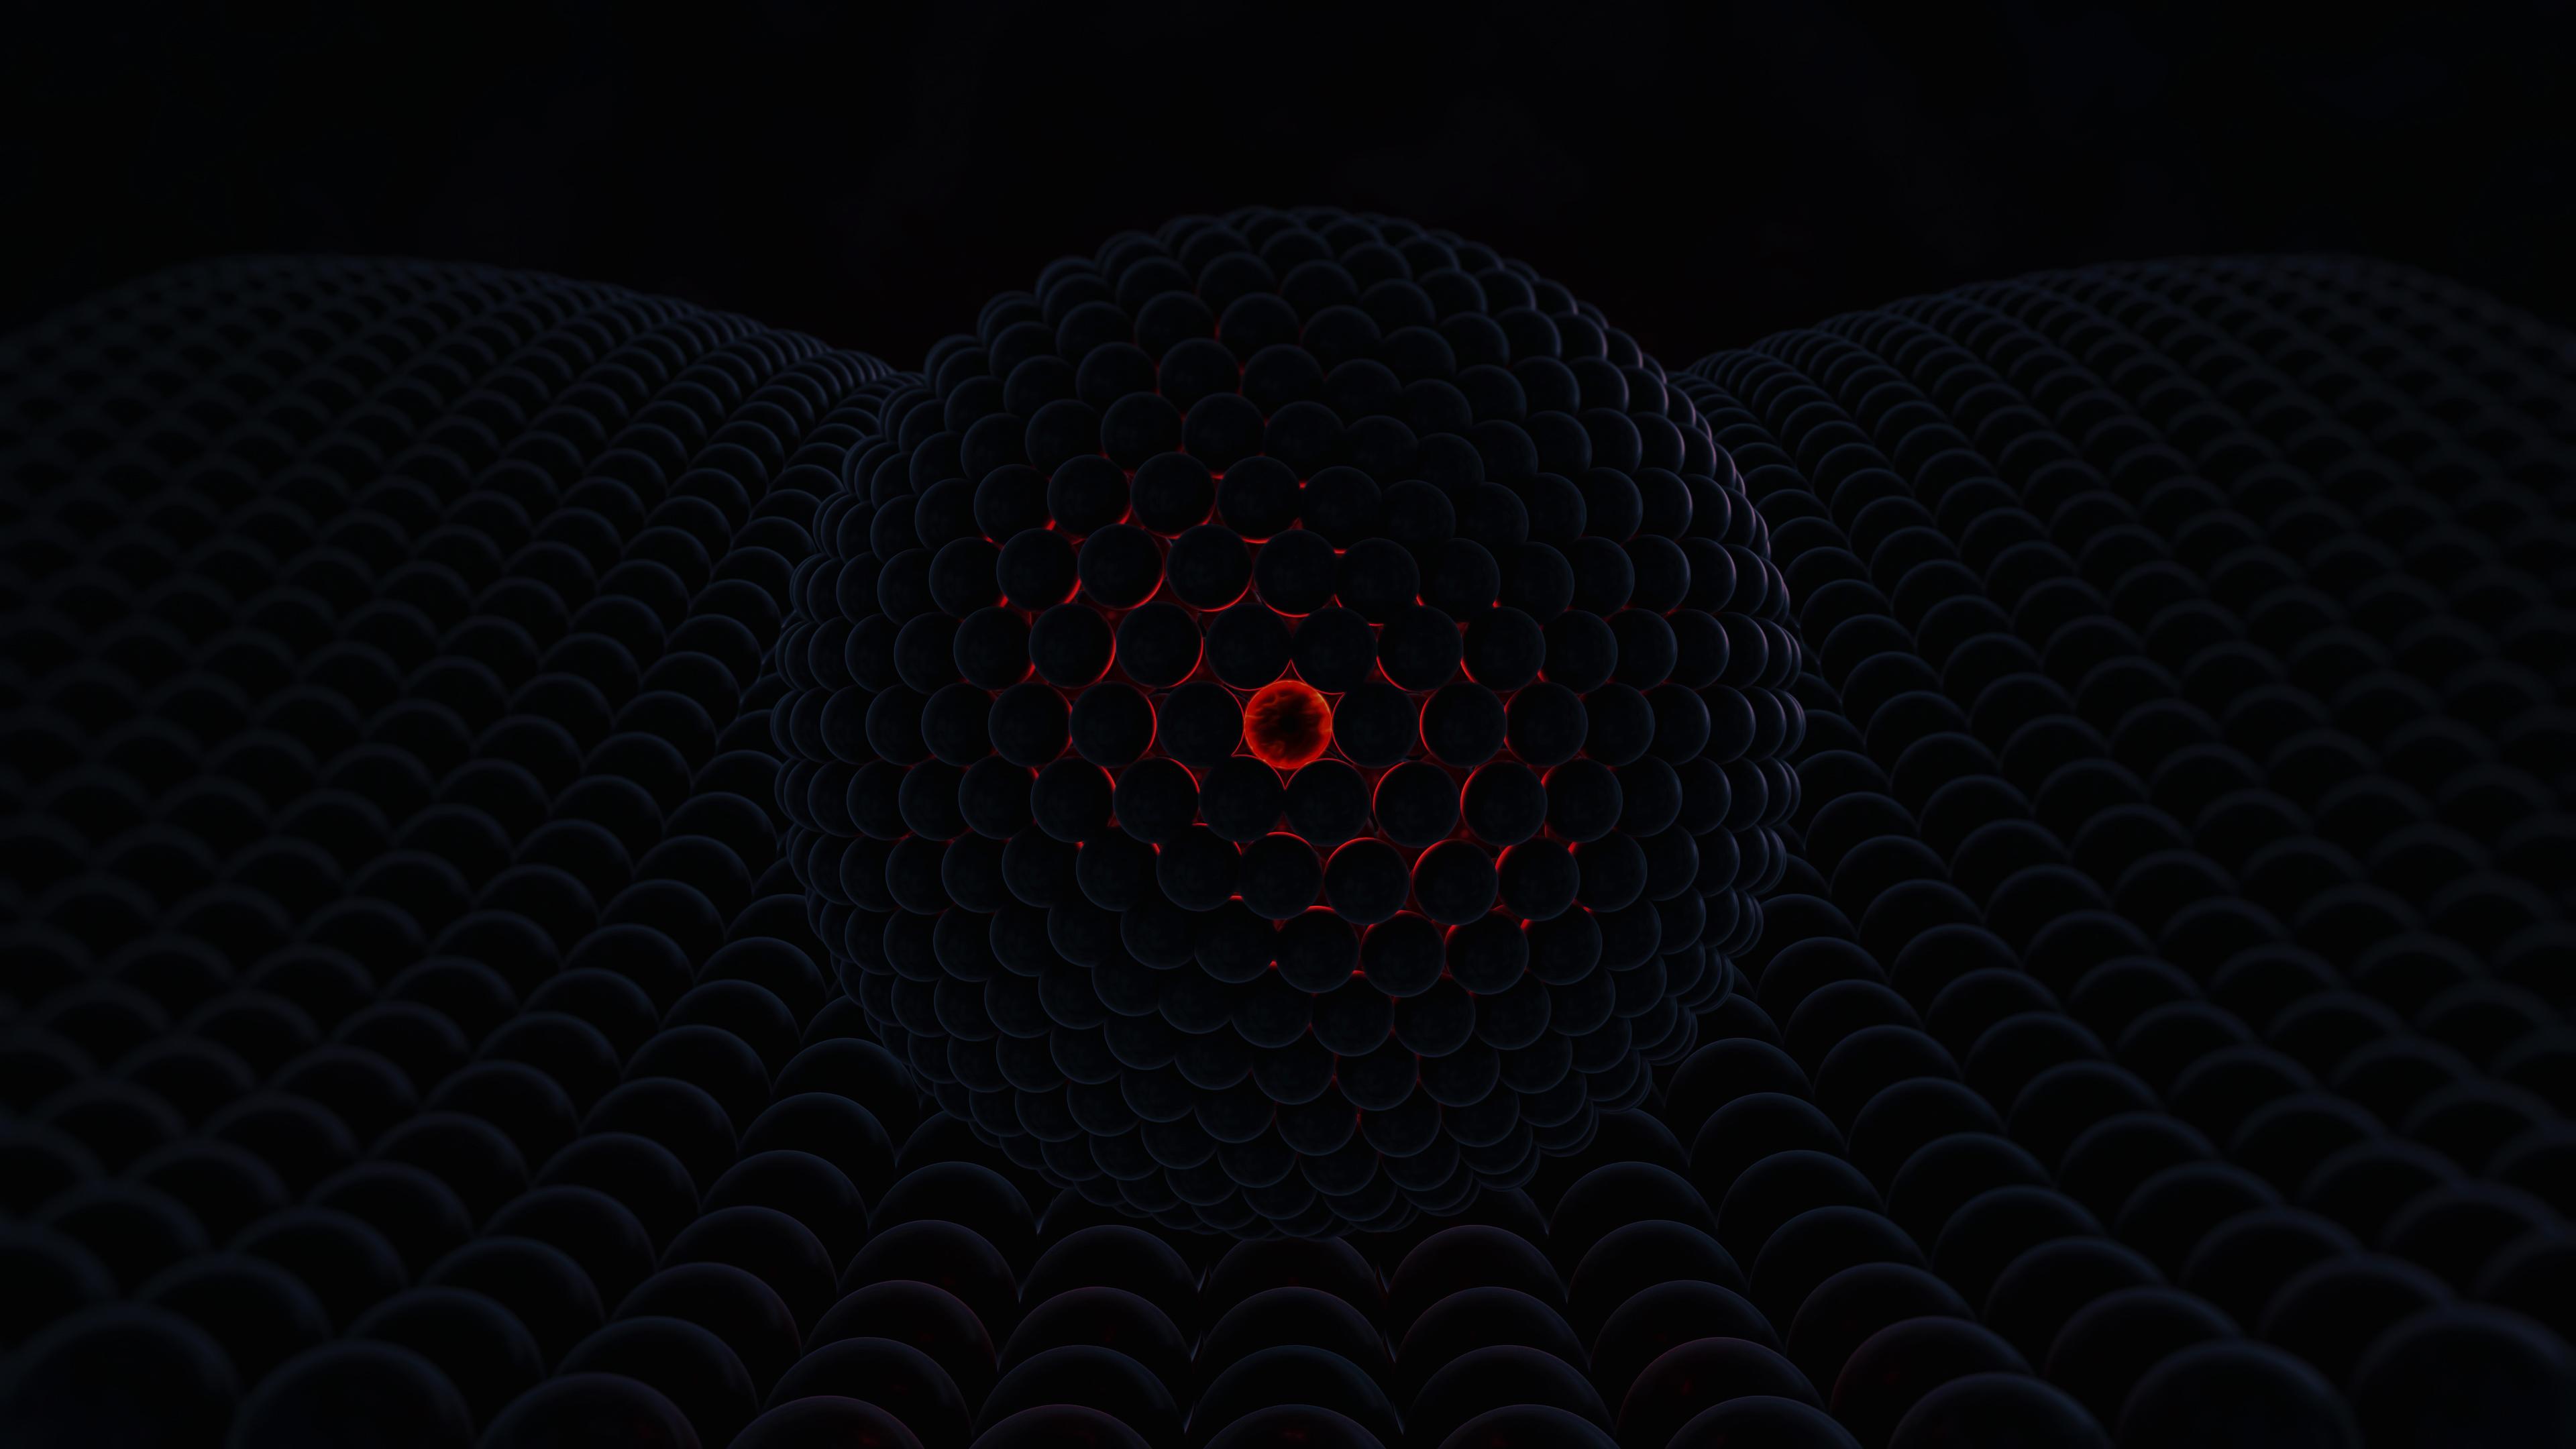 3d Abstract Red Cgi Digital Art 4k, HD 3D, 4k Wallpapers ...